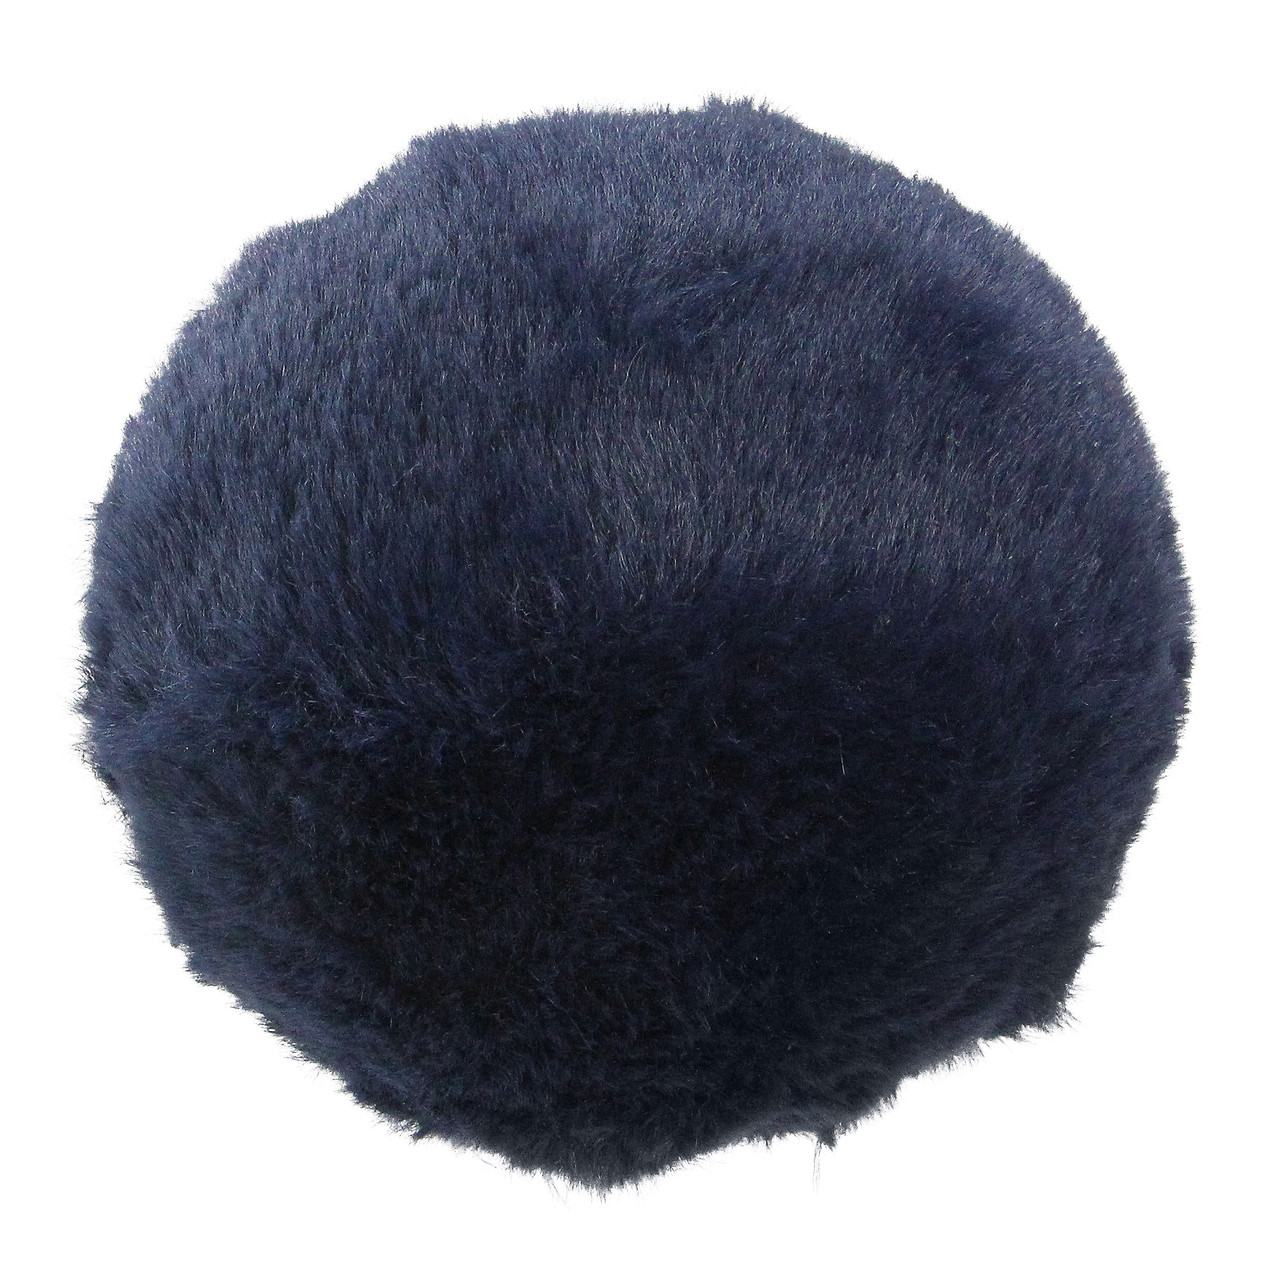 45 navy blue faux fur ball christmas ornament decoration 32627488 - Navy Blue Christmas Ornaments